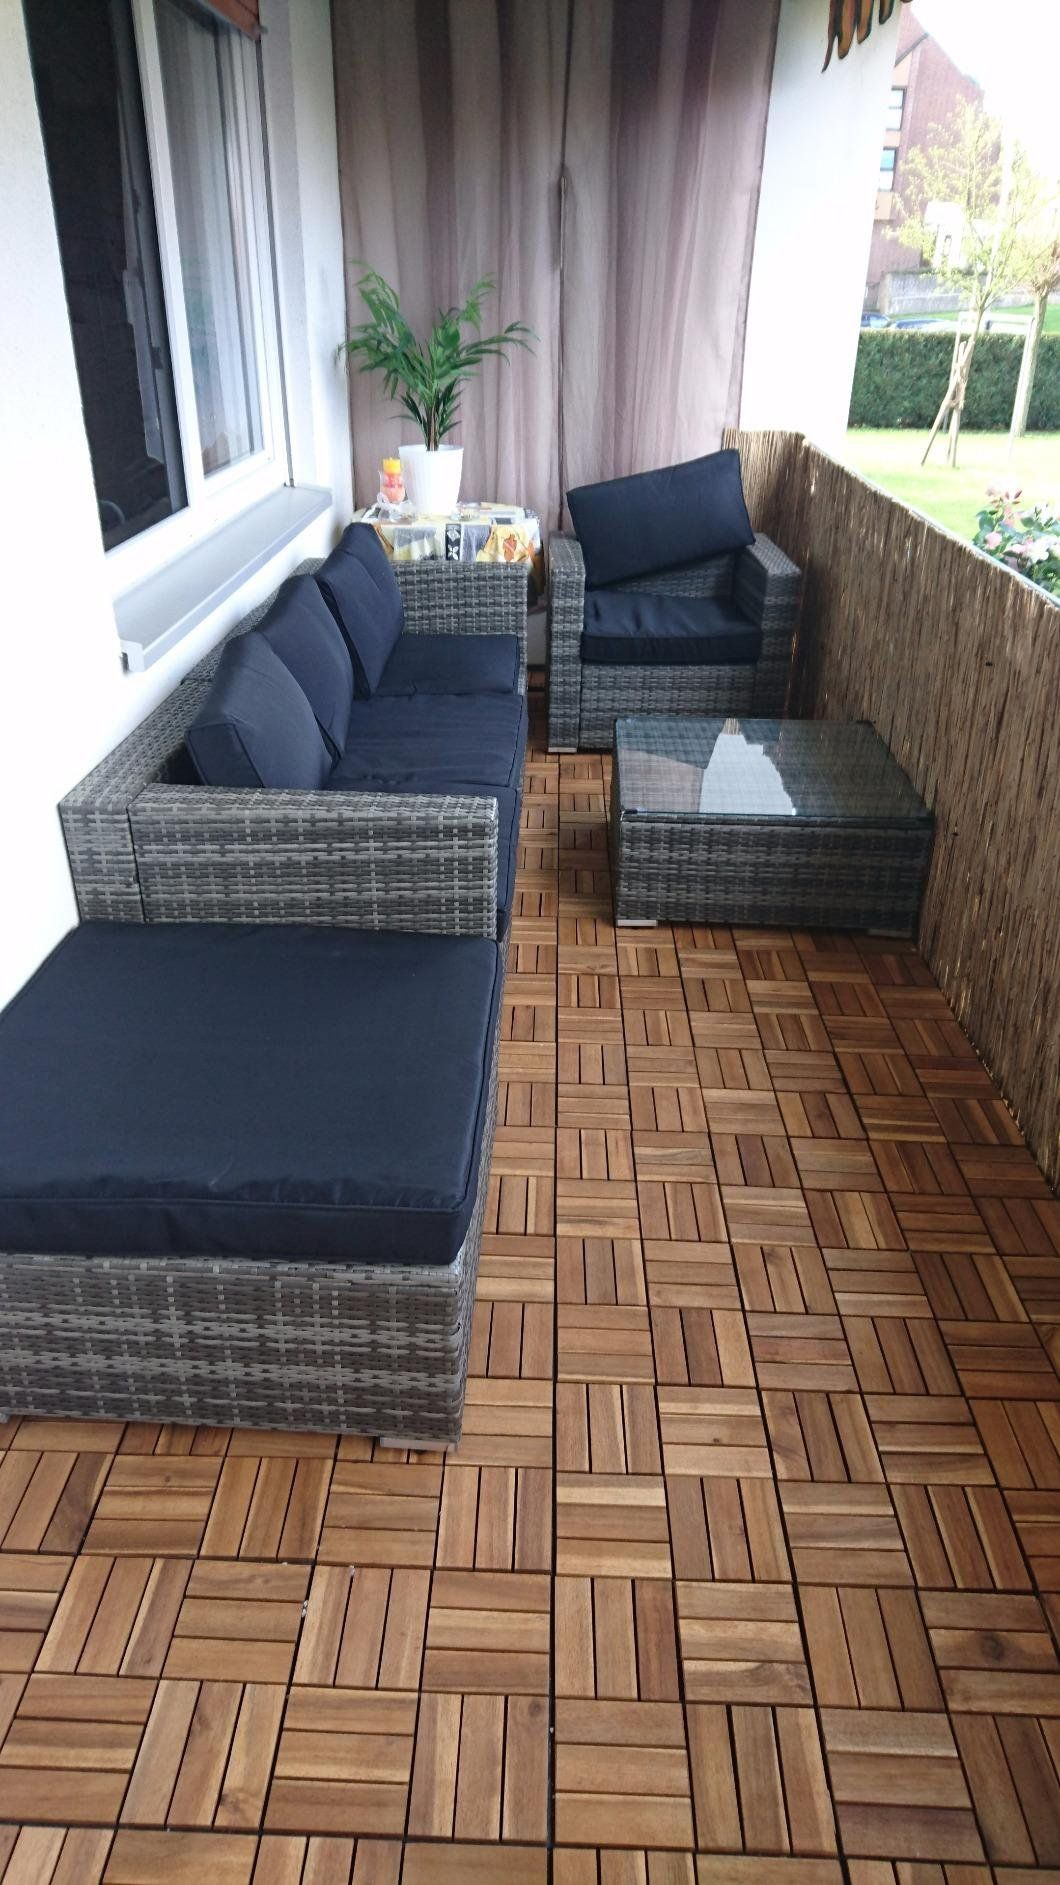 13tlg Lounge Set Gartenmobel Rattan Set Polyrattan Sitzgruppe